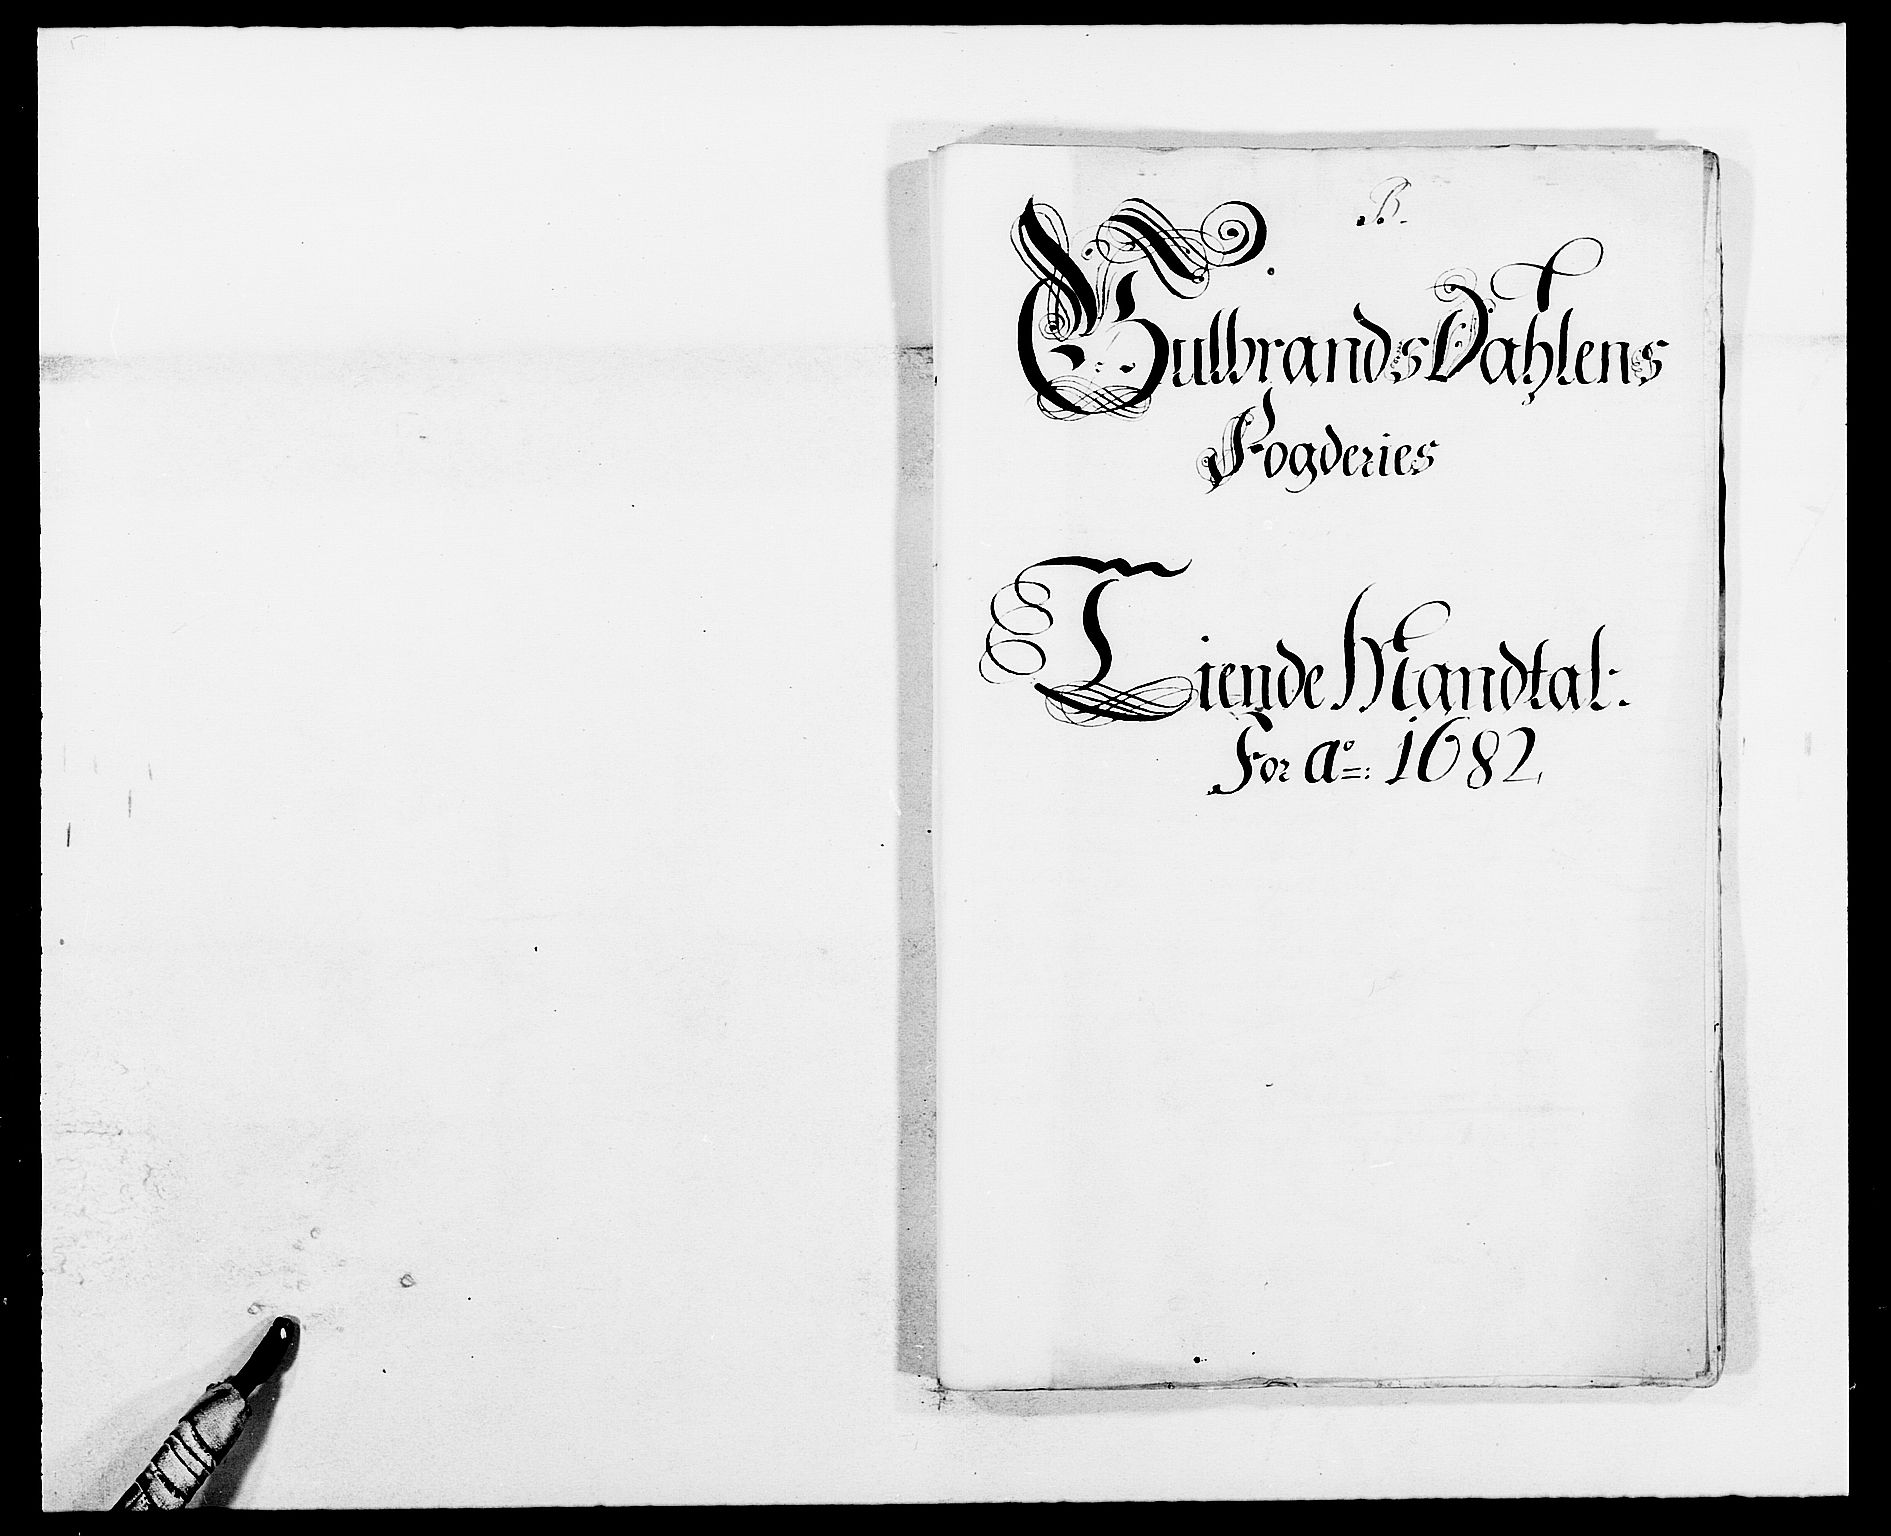 RA, Rentekammeret inntil 1814, Reviderte regnskaper, Fogderegnskap, R17/L1157: Fogderegnskap Gudbrandsdal, 1682-1689, s. 252